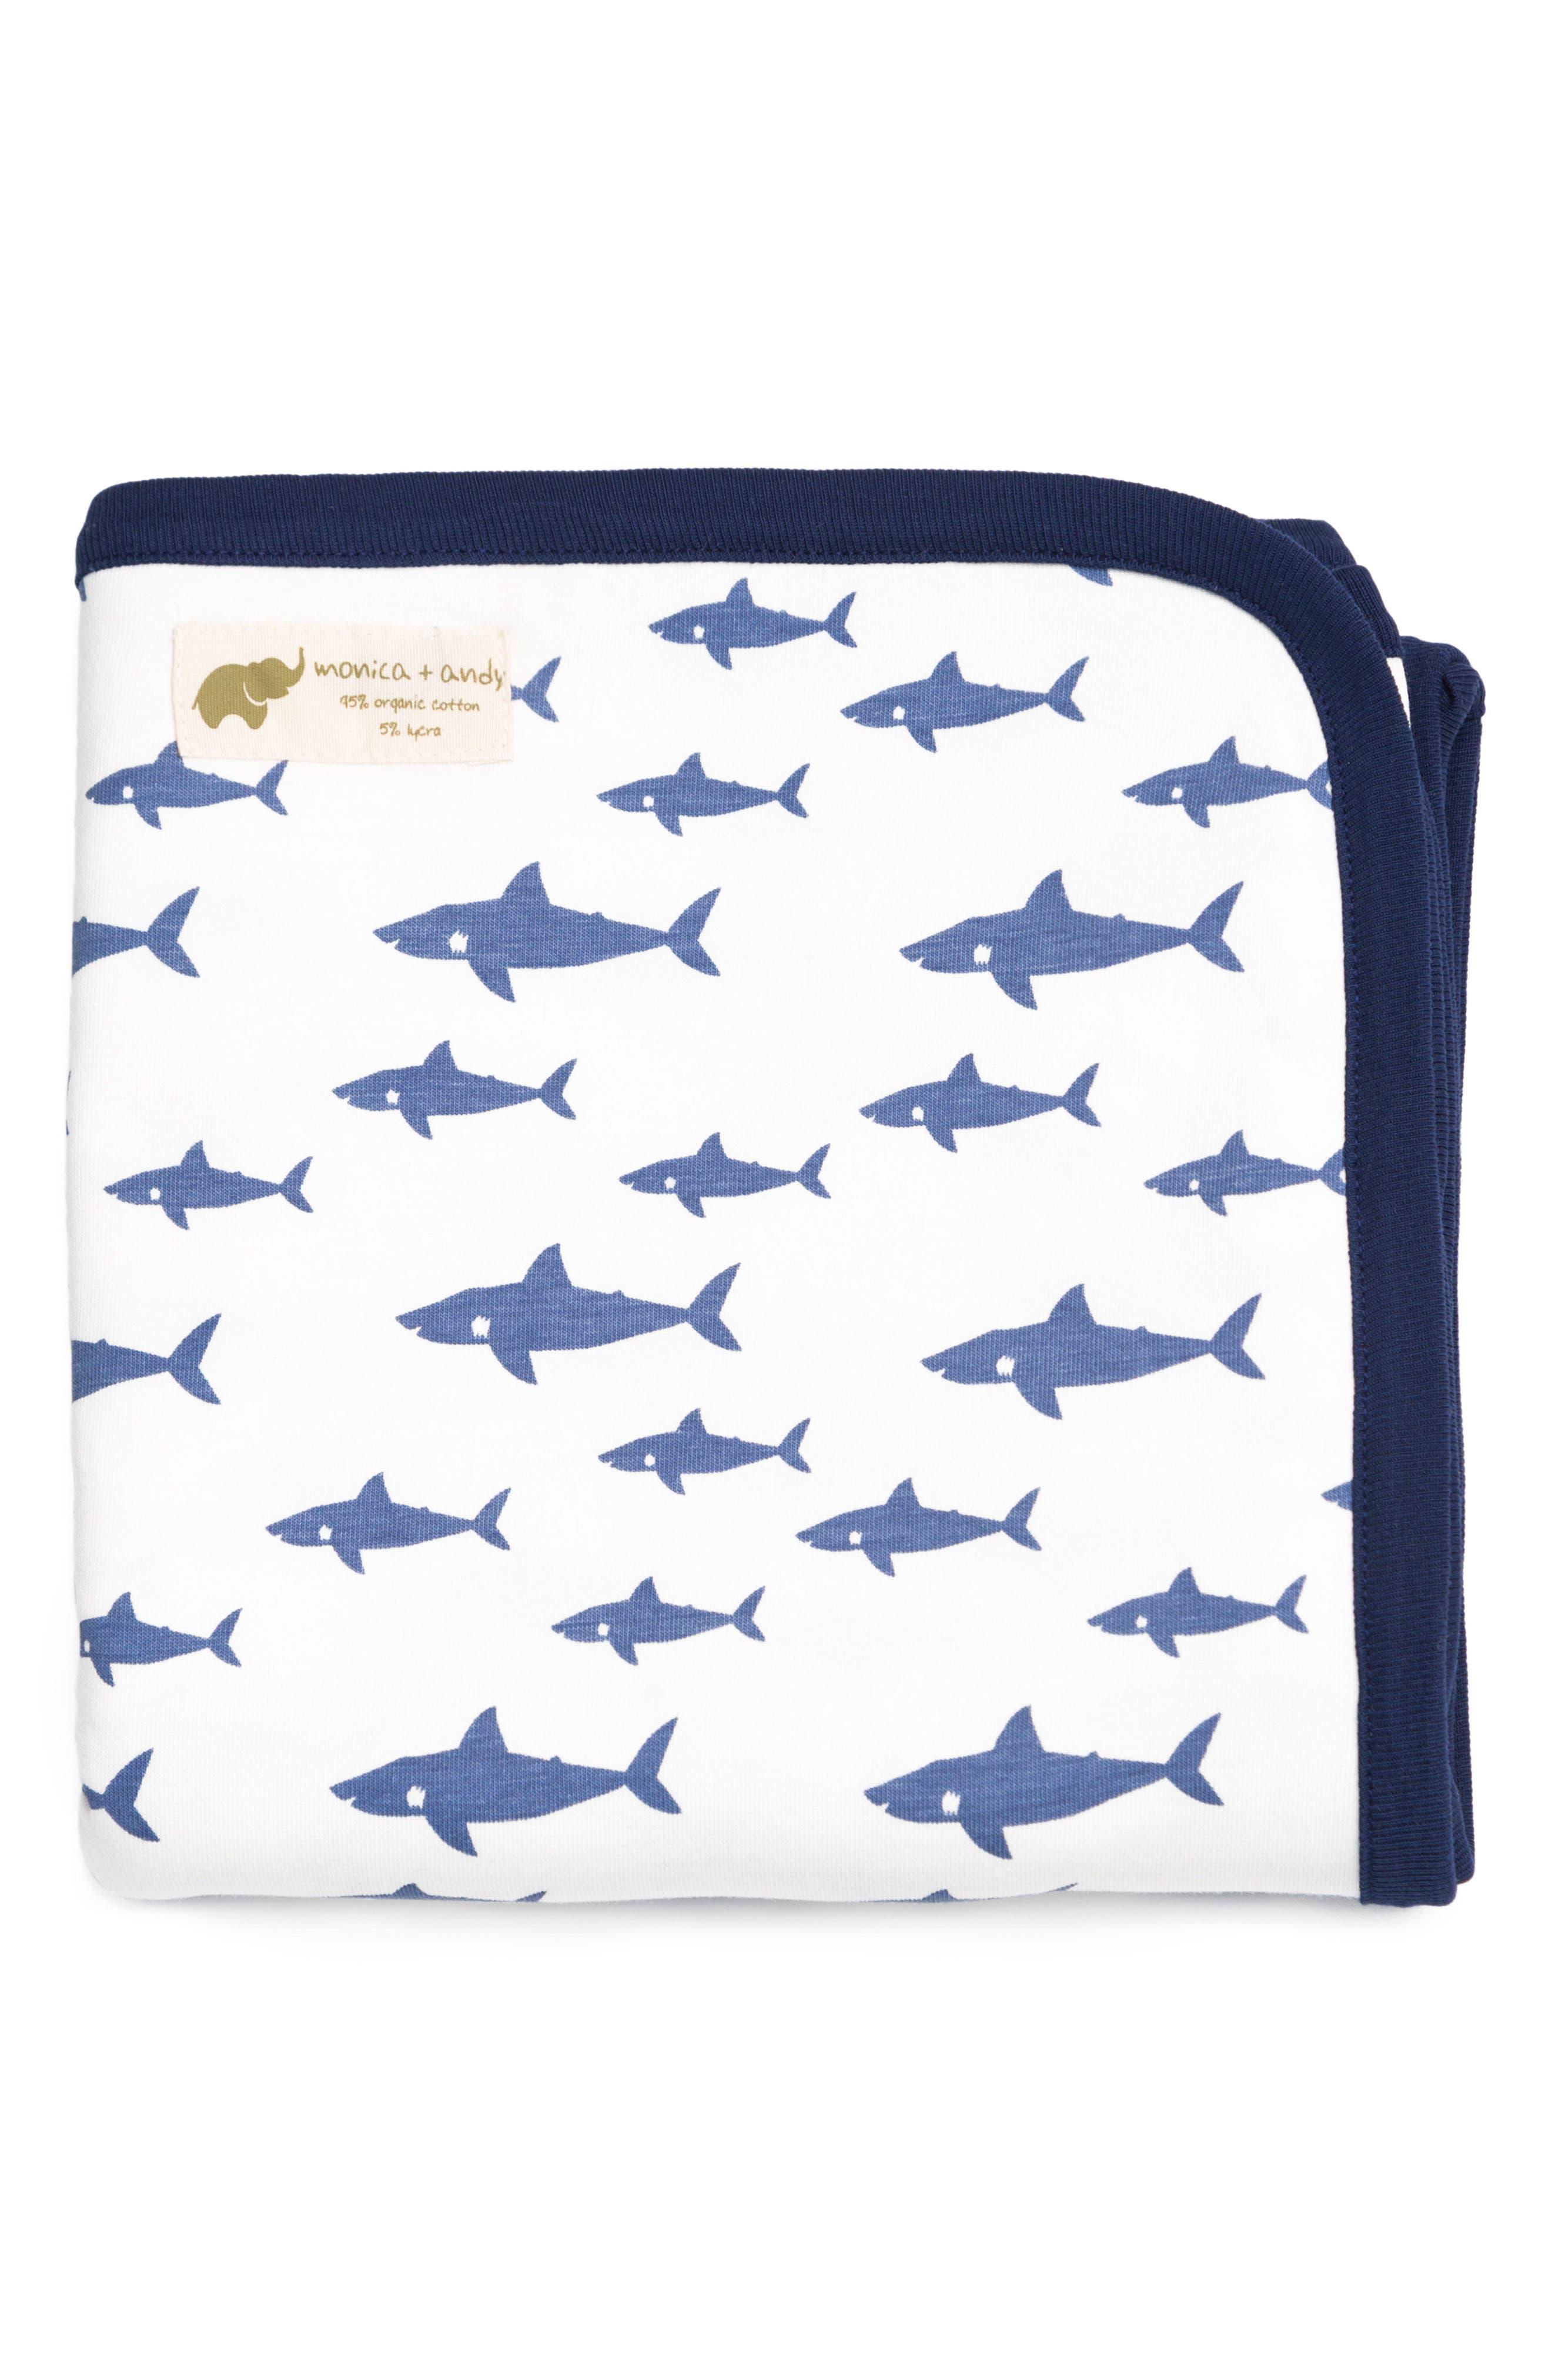 Shark Attack Coming Home Blanket,                         Main,                         color, SHARK ATTACK